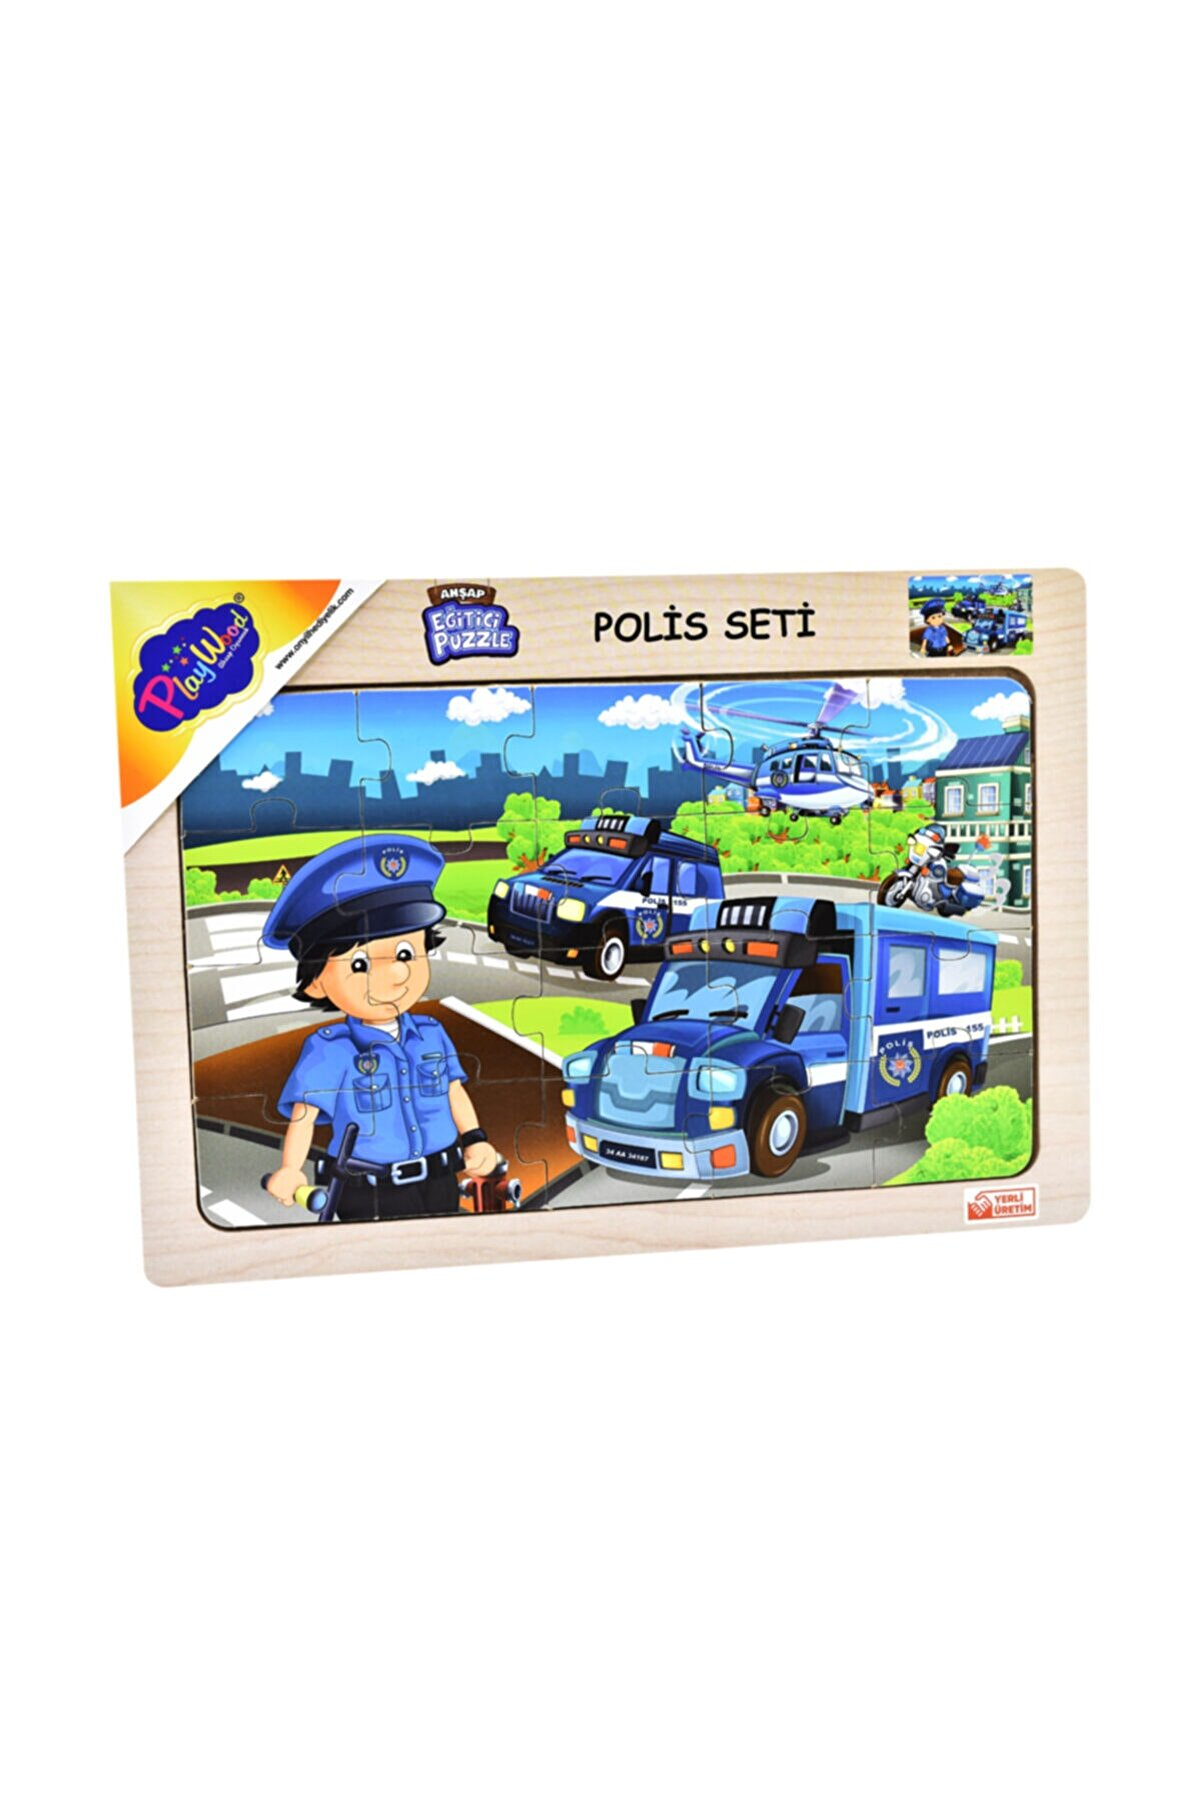 ONYIL OYUNCAK Playwood Ahşap Eğitici Puzzle Seti Polis Seti